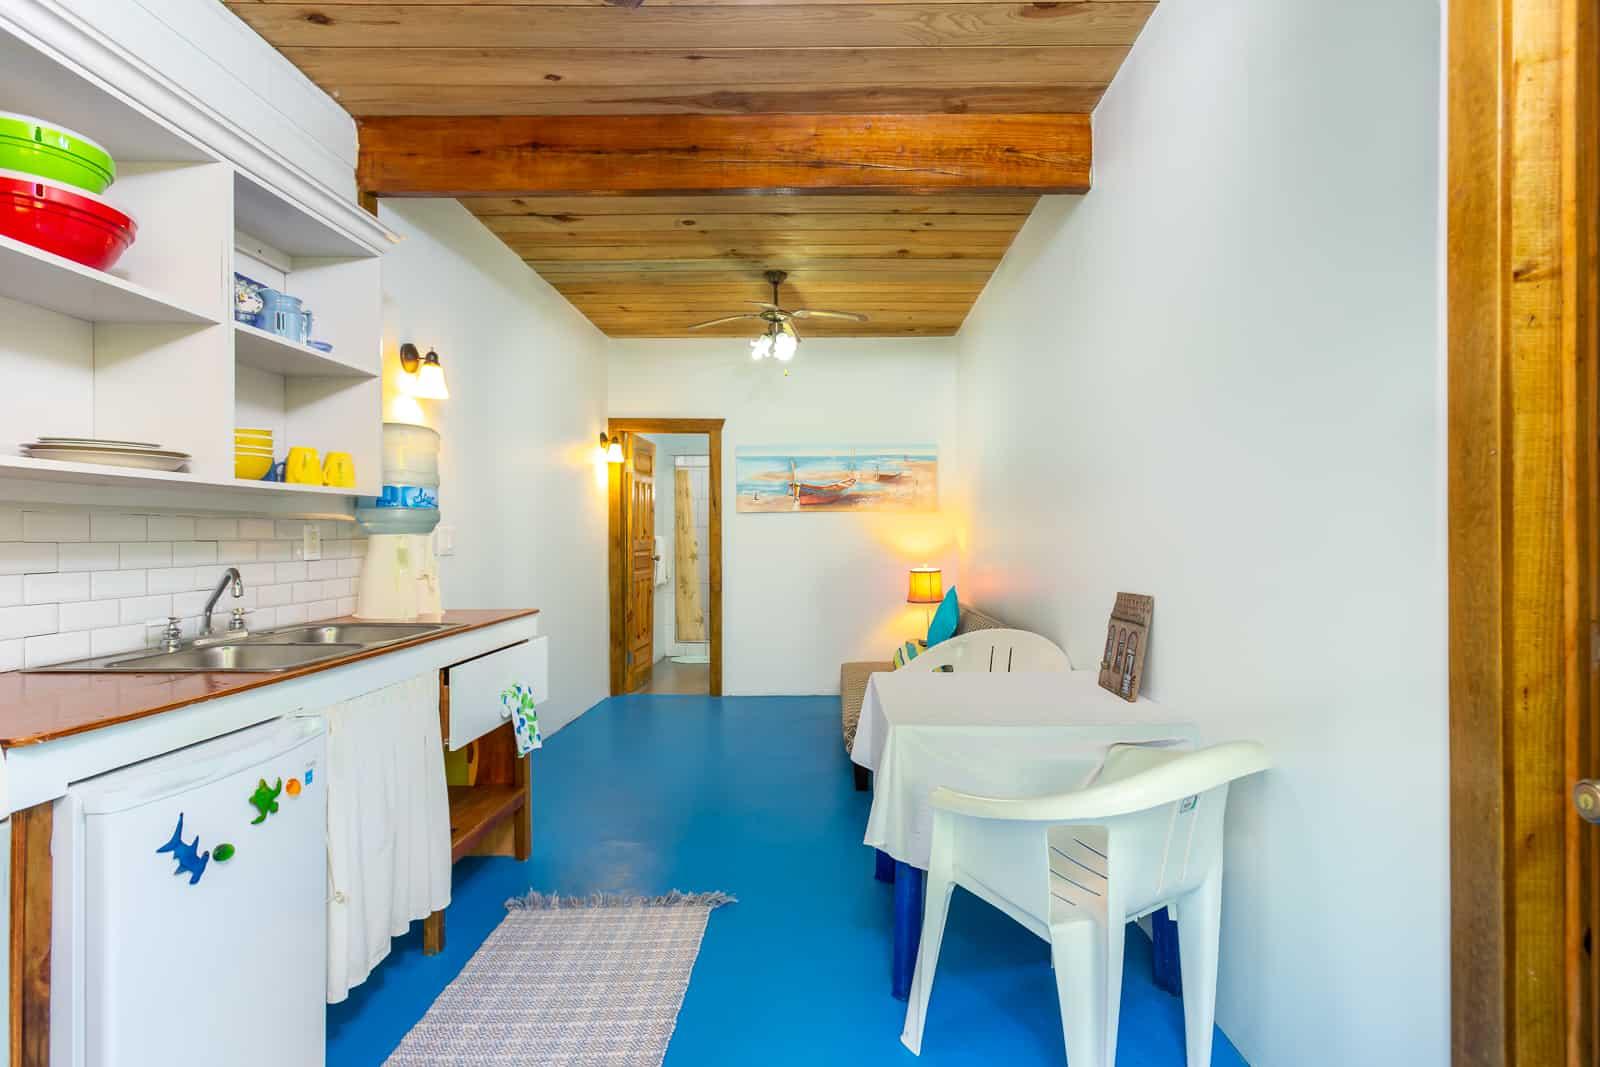 https://roatan-guavagrove.com/wp-content/uploads/2020/03/Roatan-Short-Term-Apartment-2.jpg